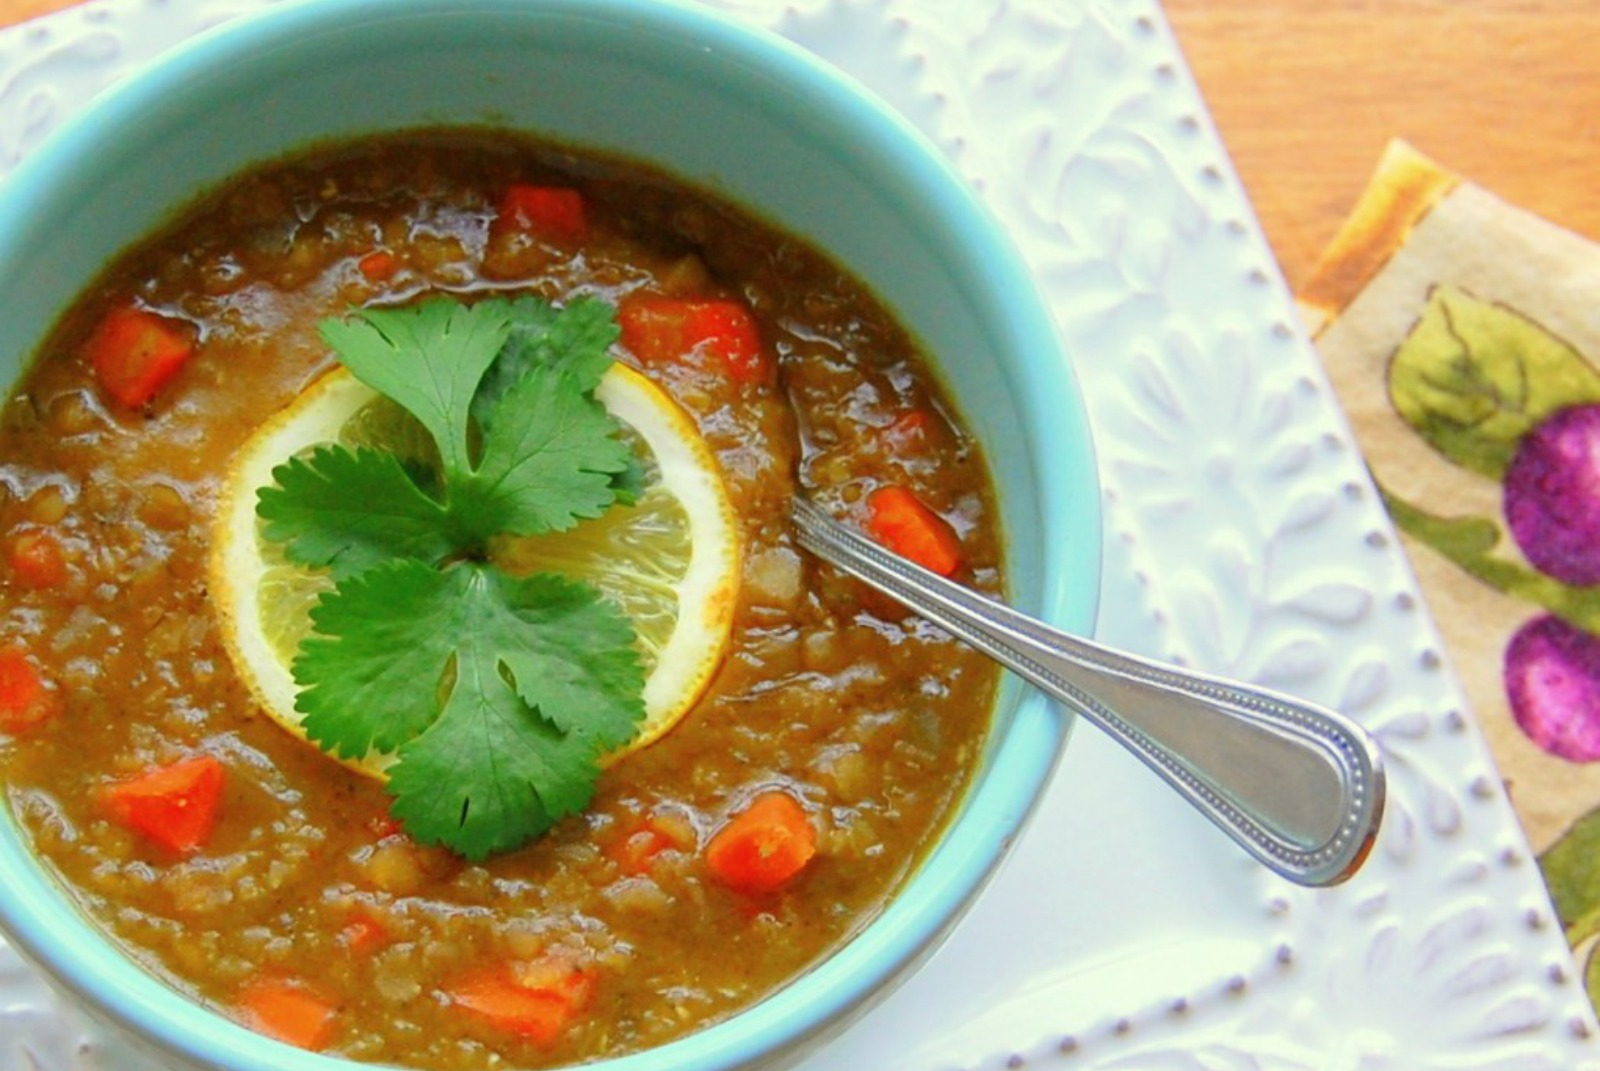 Red Lentil Soup With Fresh Cilantro and Lemon [Vegan]